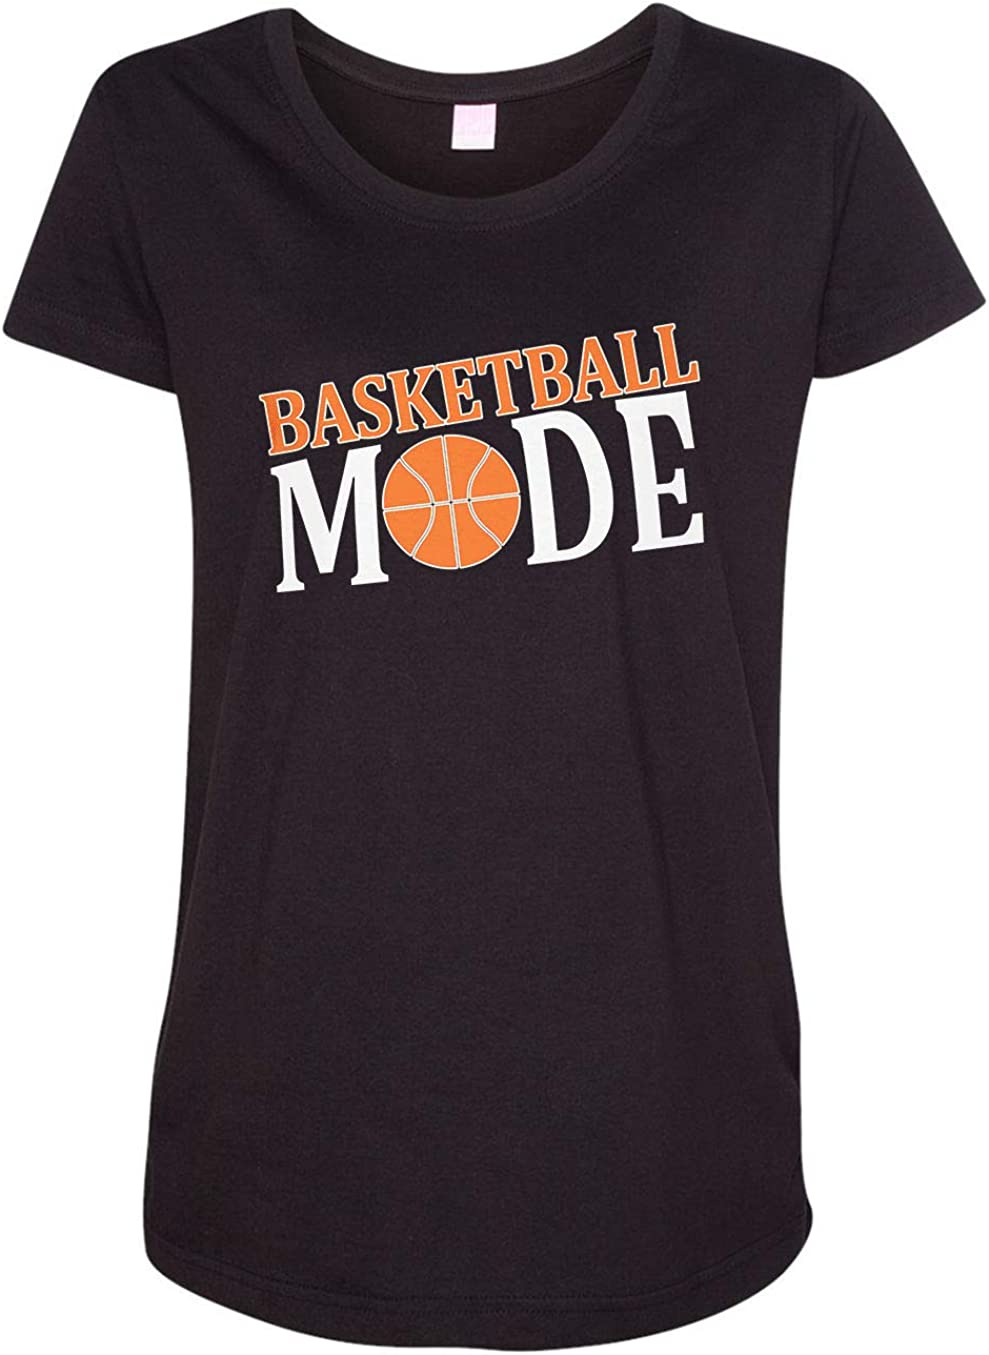 HARD EDGE DESIGN Women's Basketball Mode T-Shirt